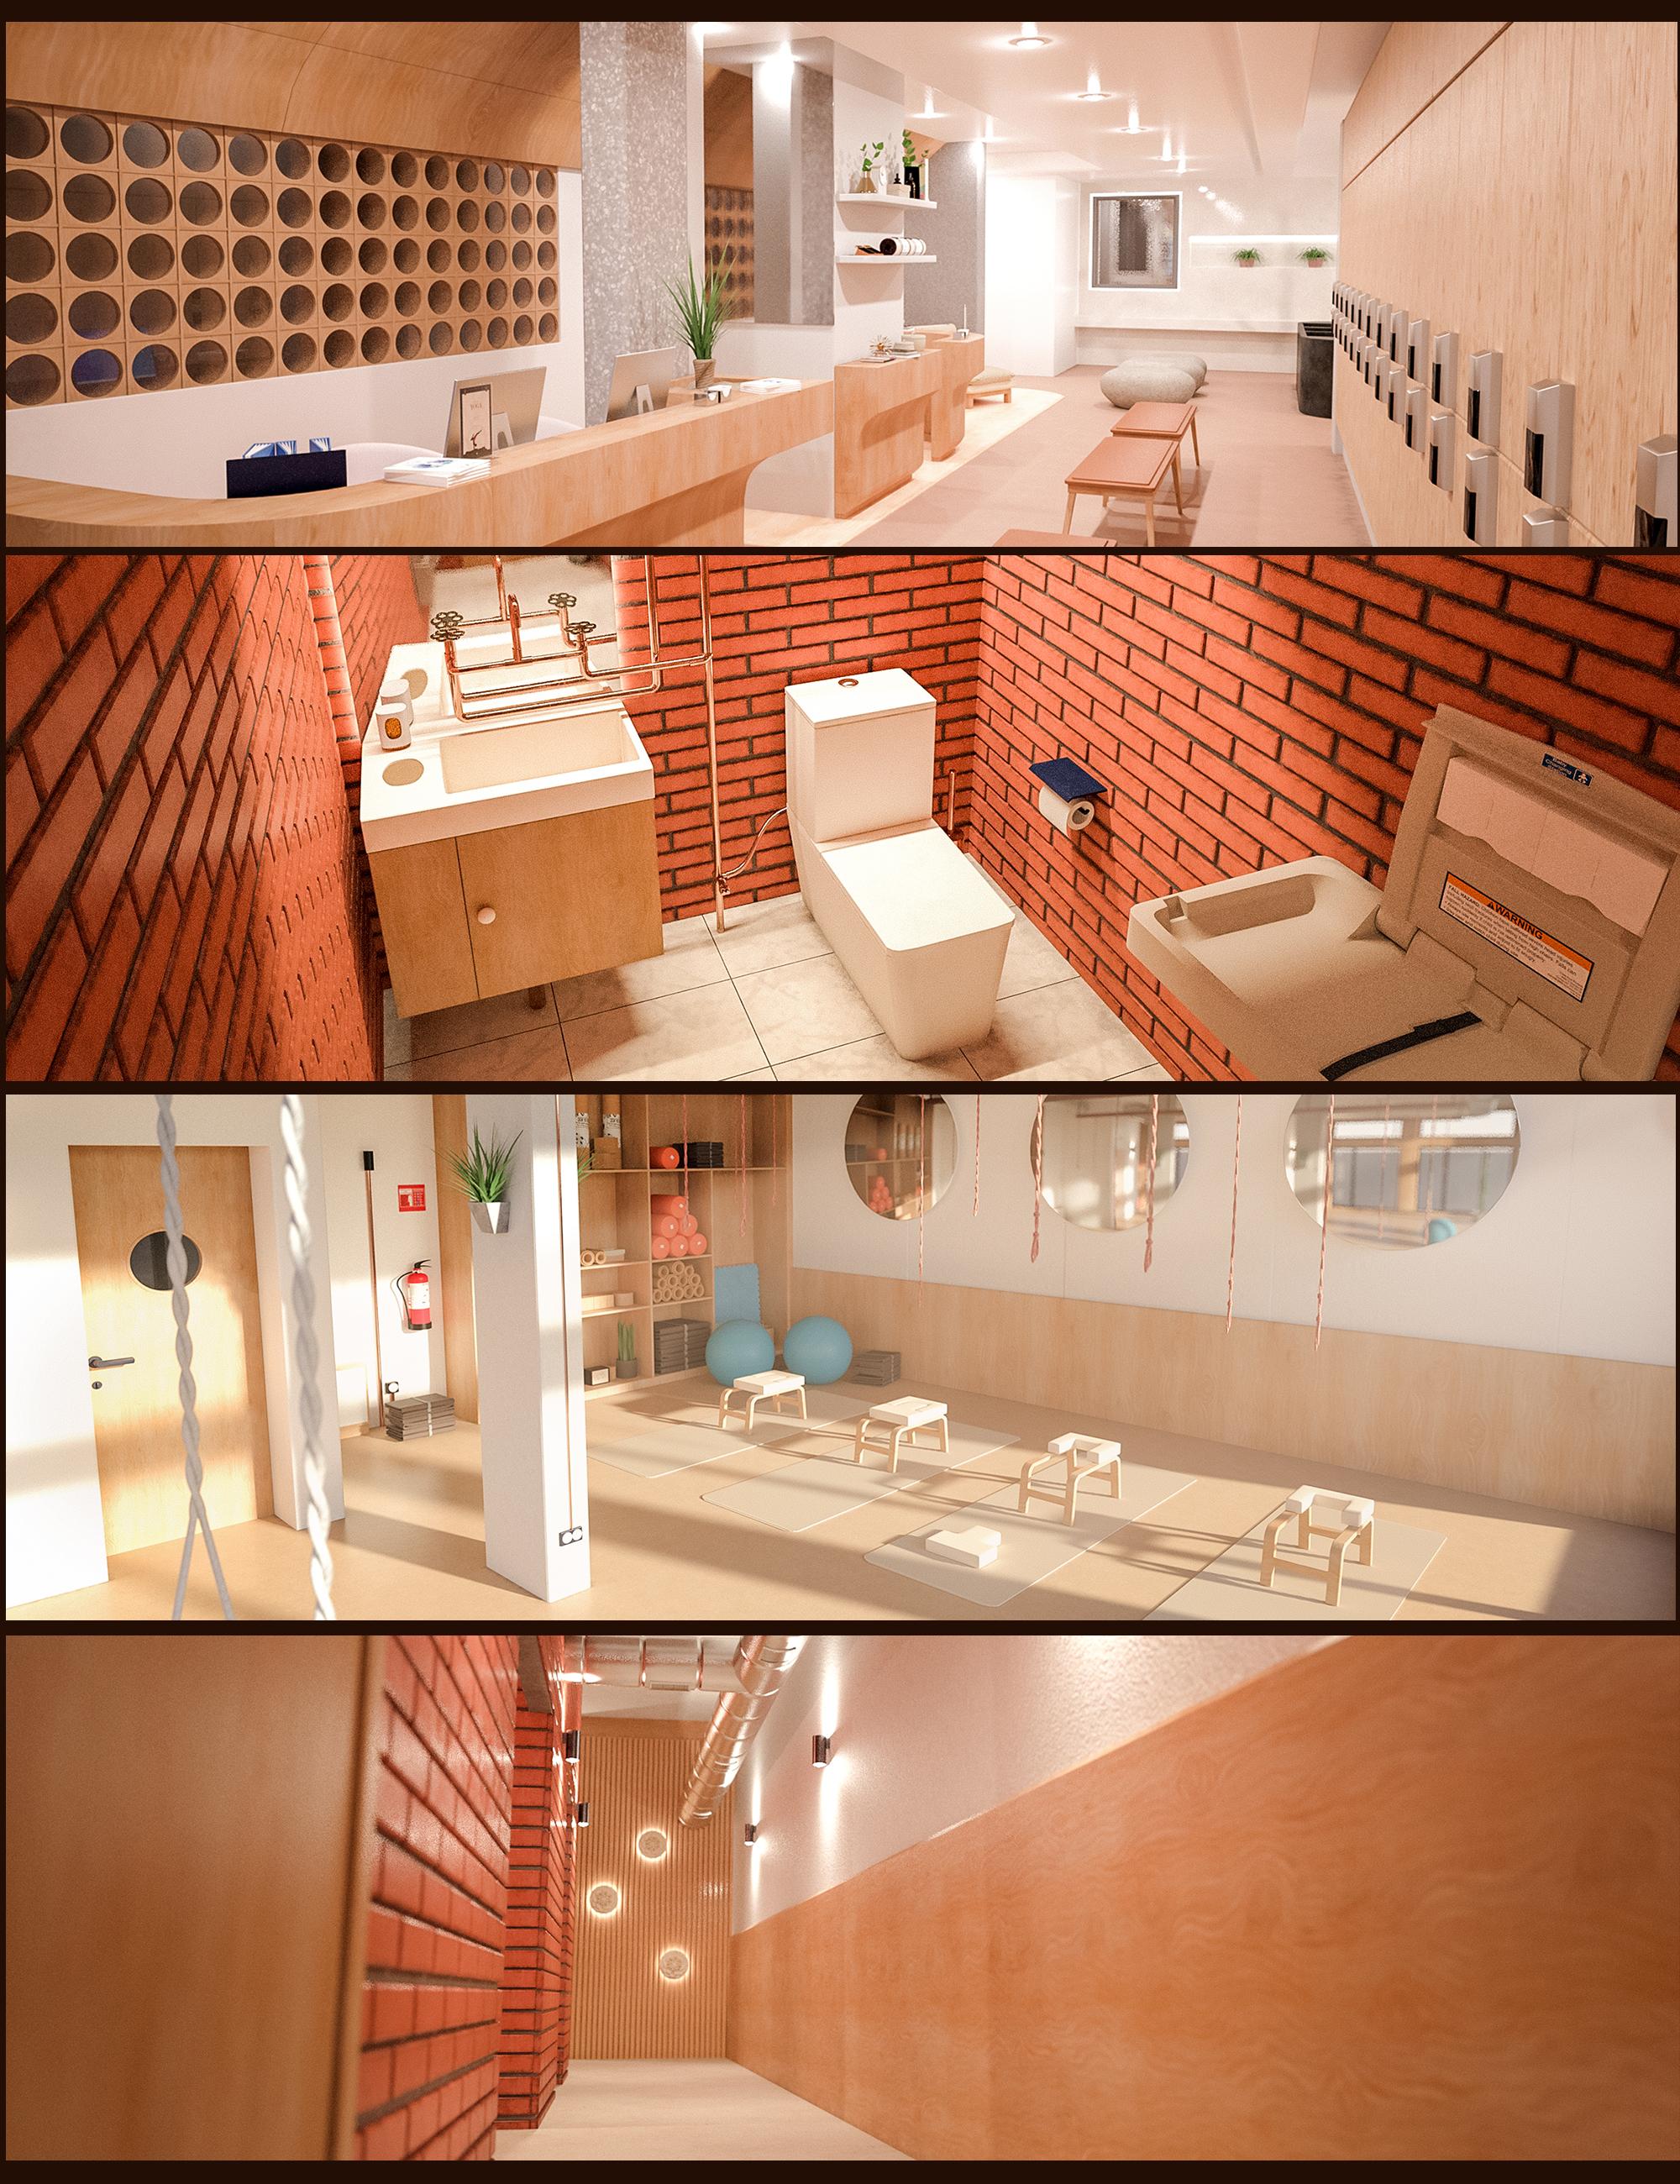 Yoga Club Environment Bundle by: Polish, 3D Models by Daz 3D